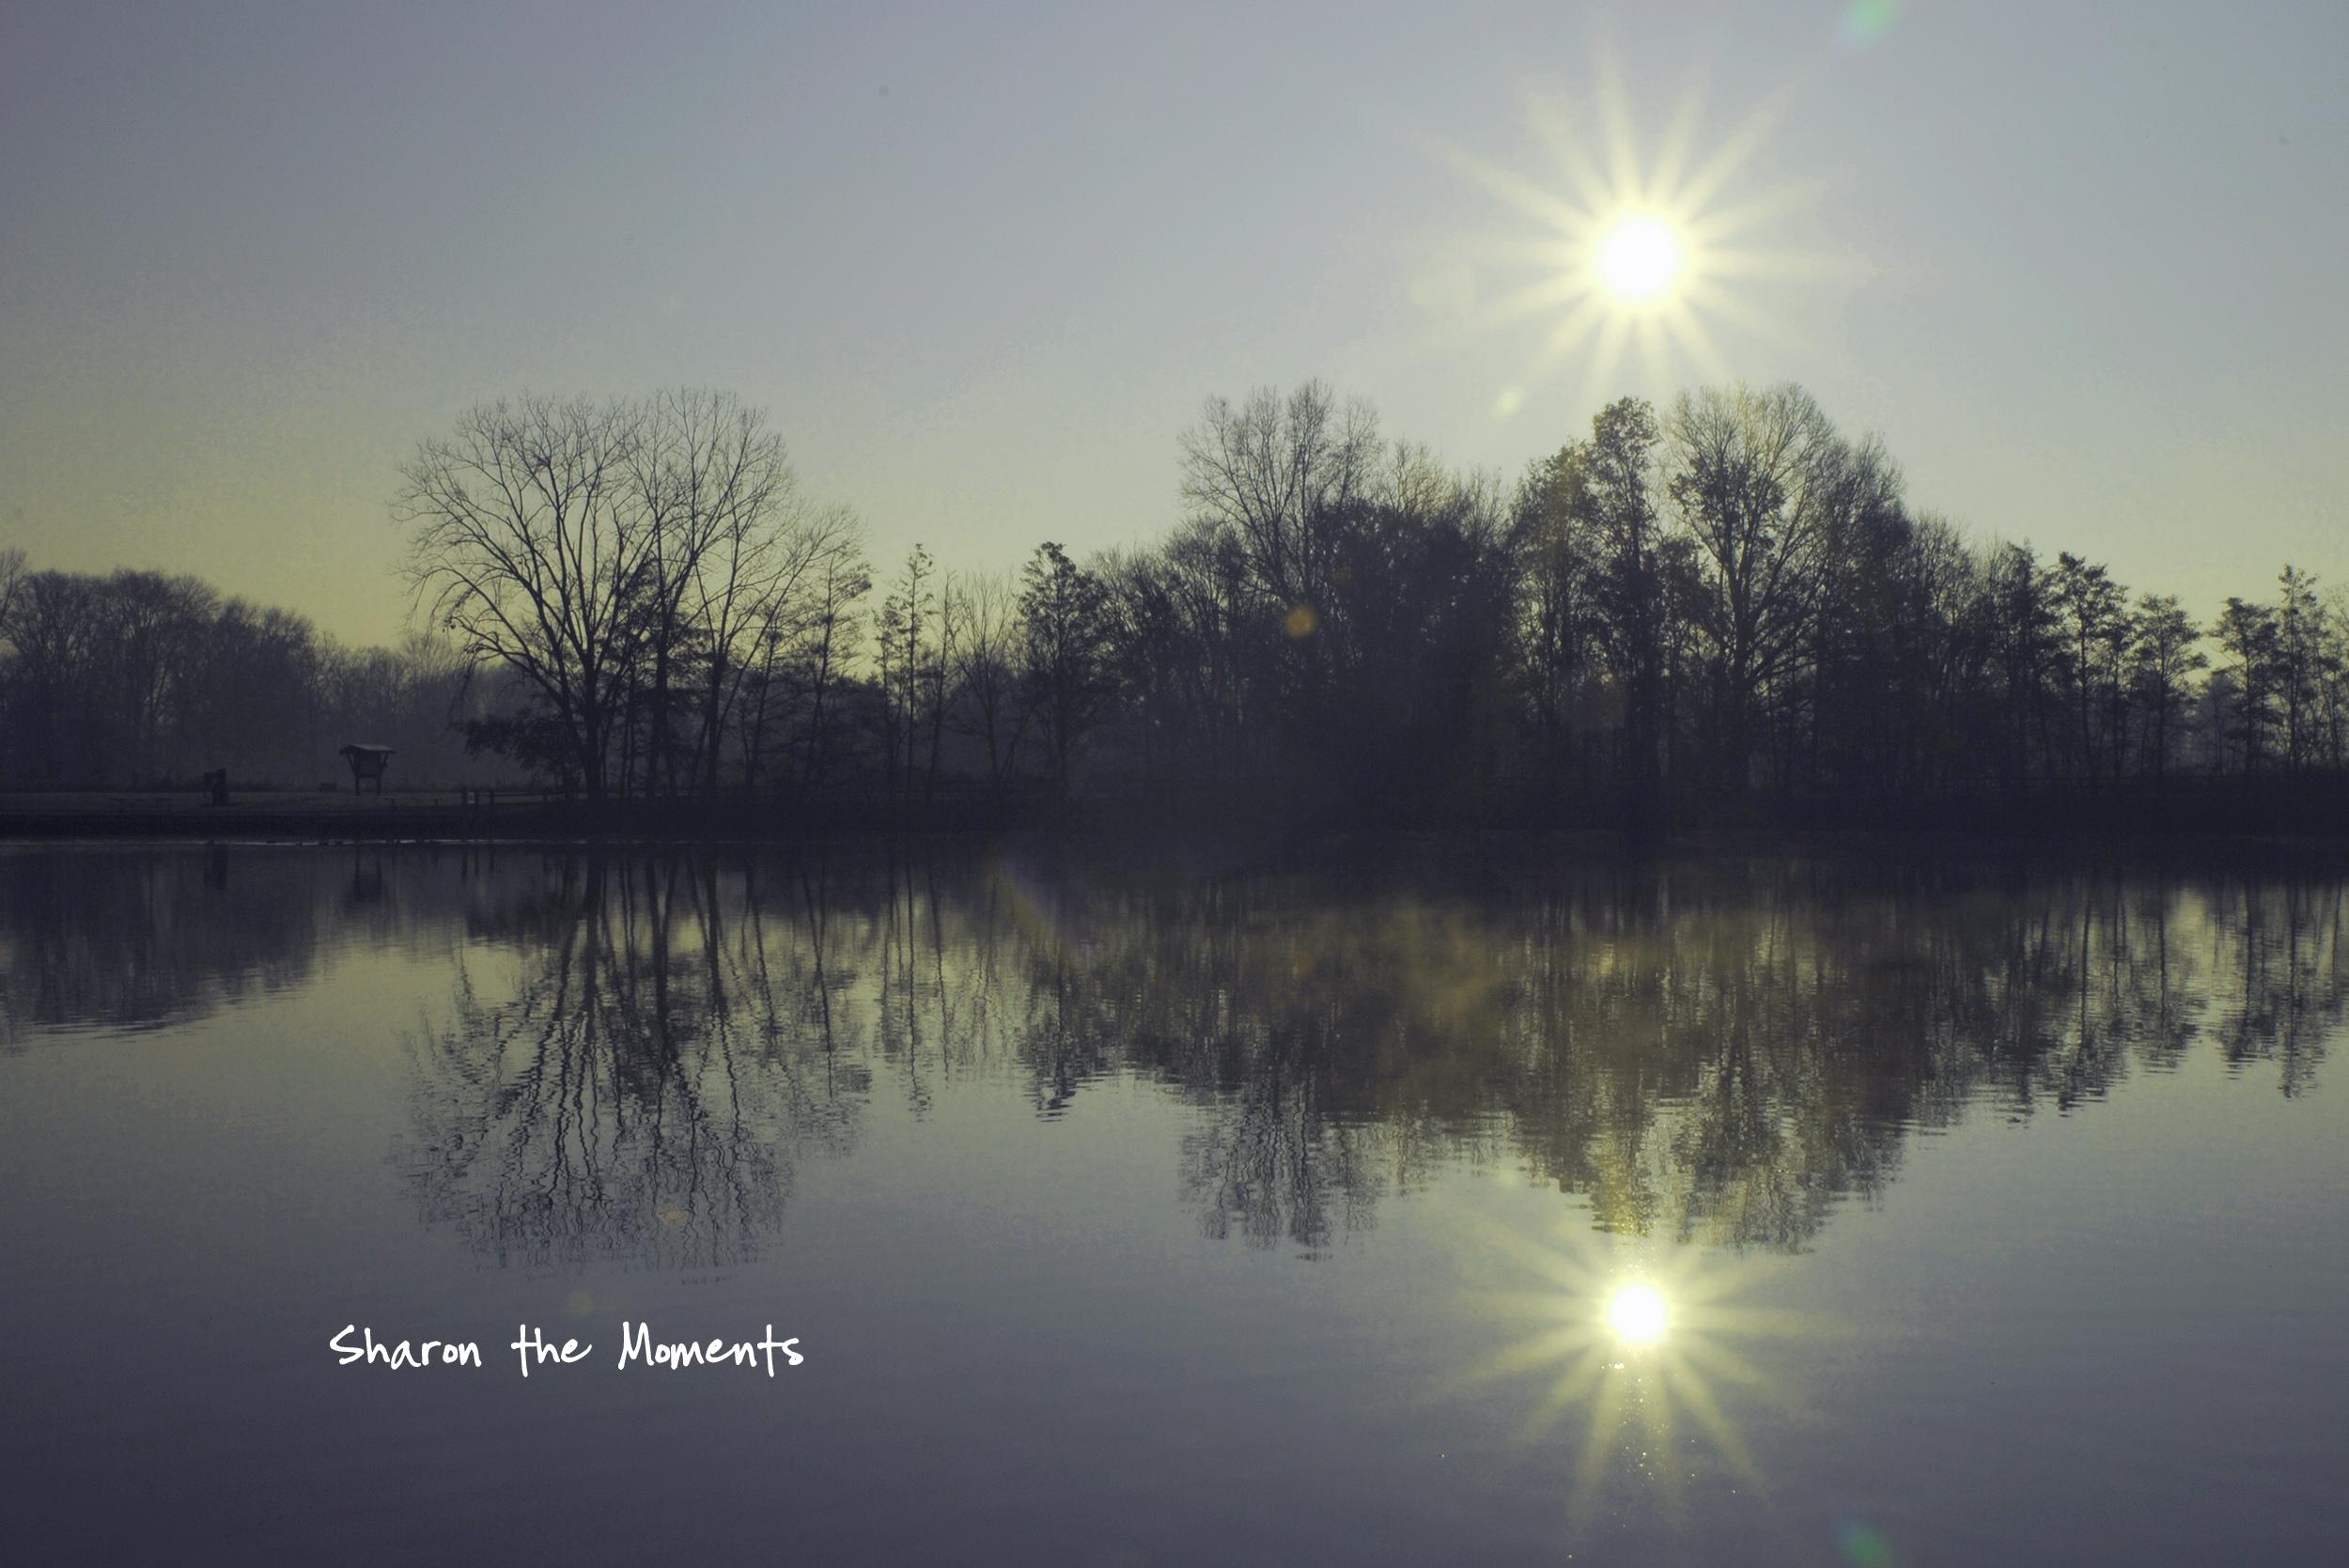 Favorite Photo Friday at Sharon Woods Schrock Lake|Sharon the Moments blog